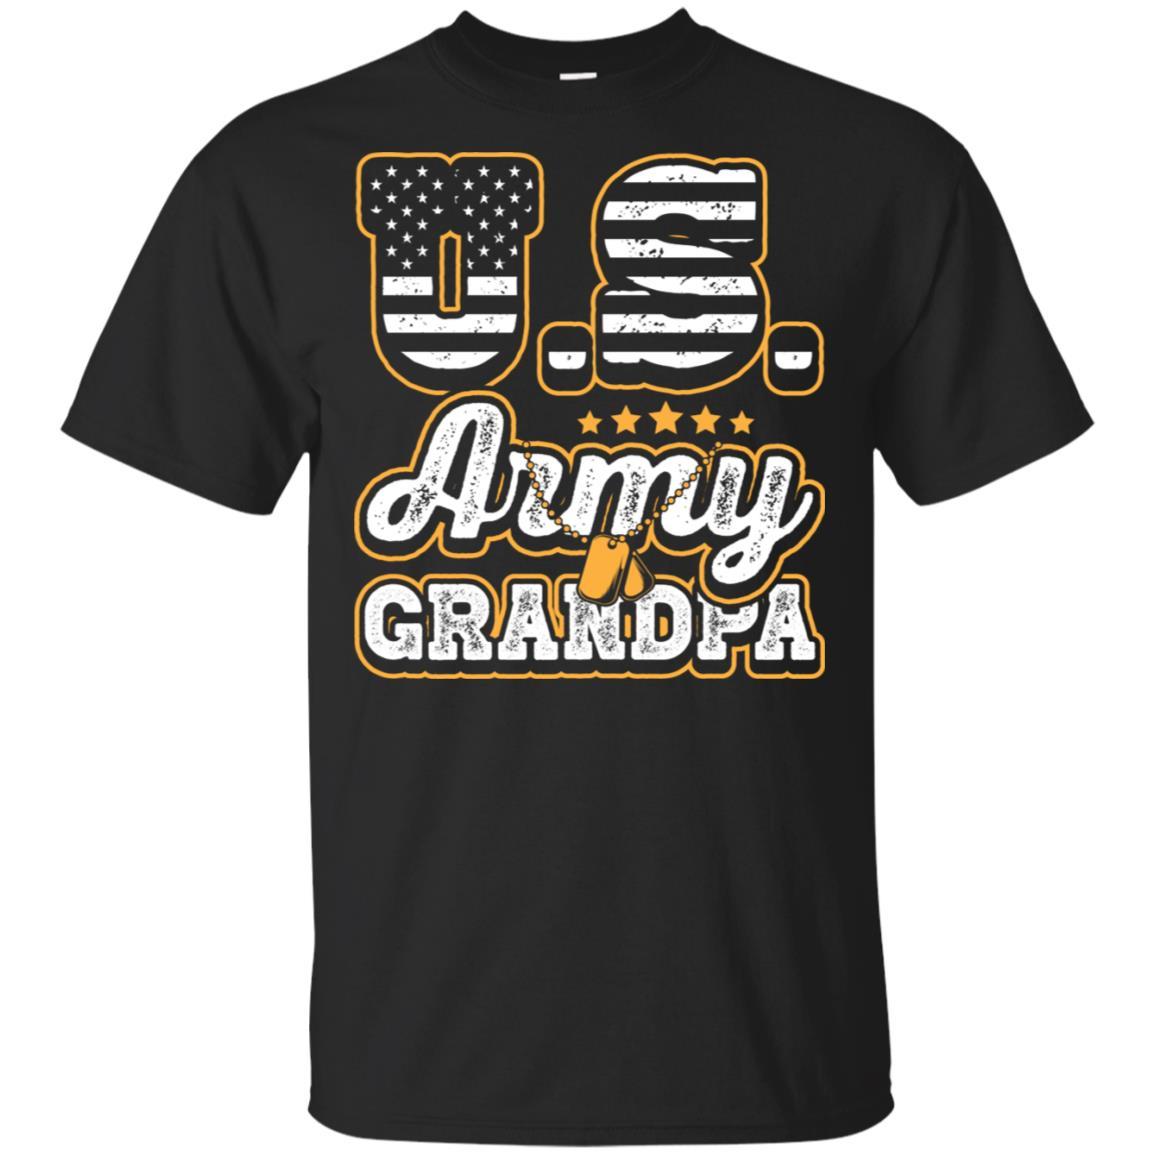 Us Army Grandpa 22013 Unisex Short Sleeve